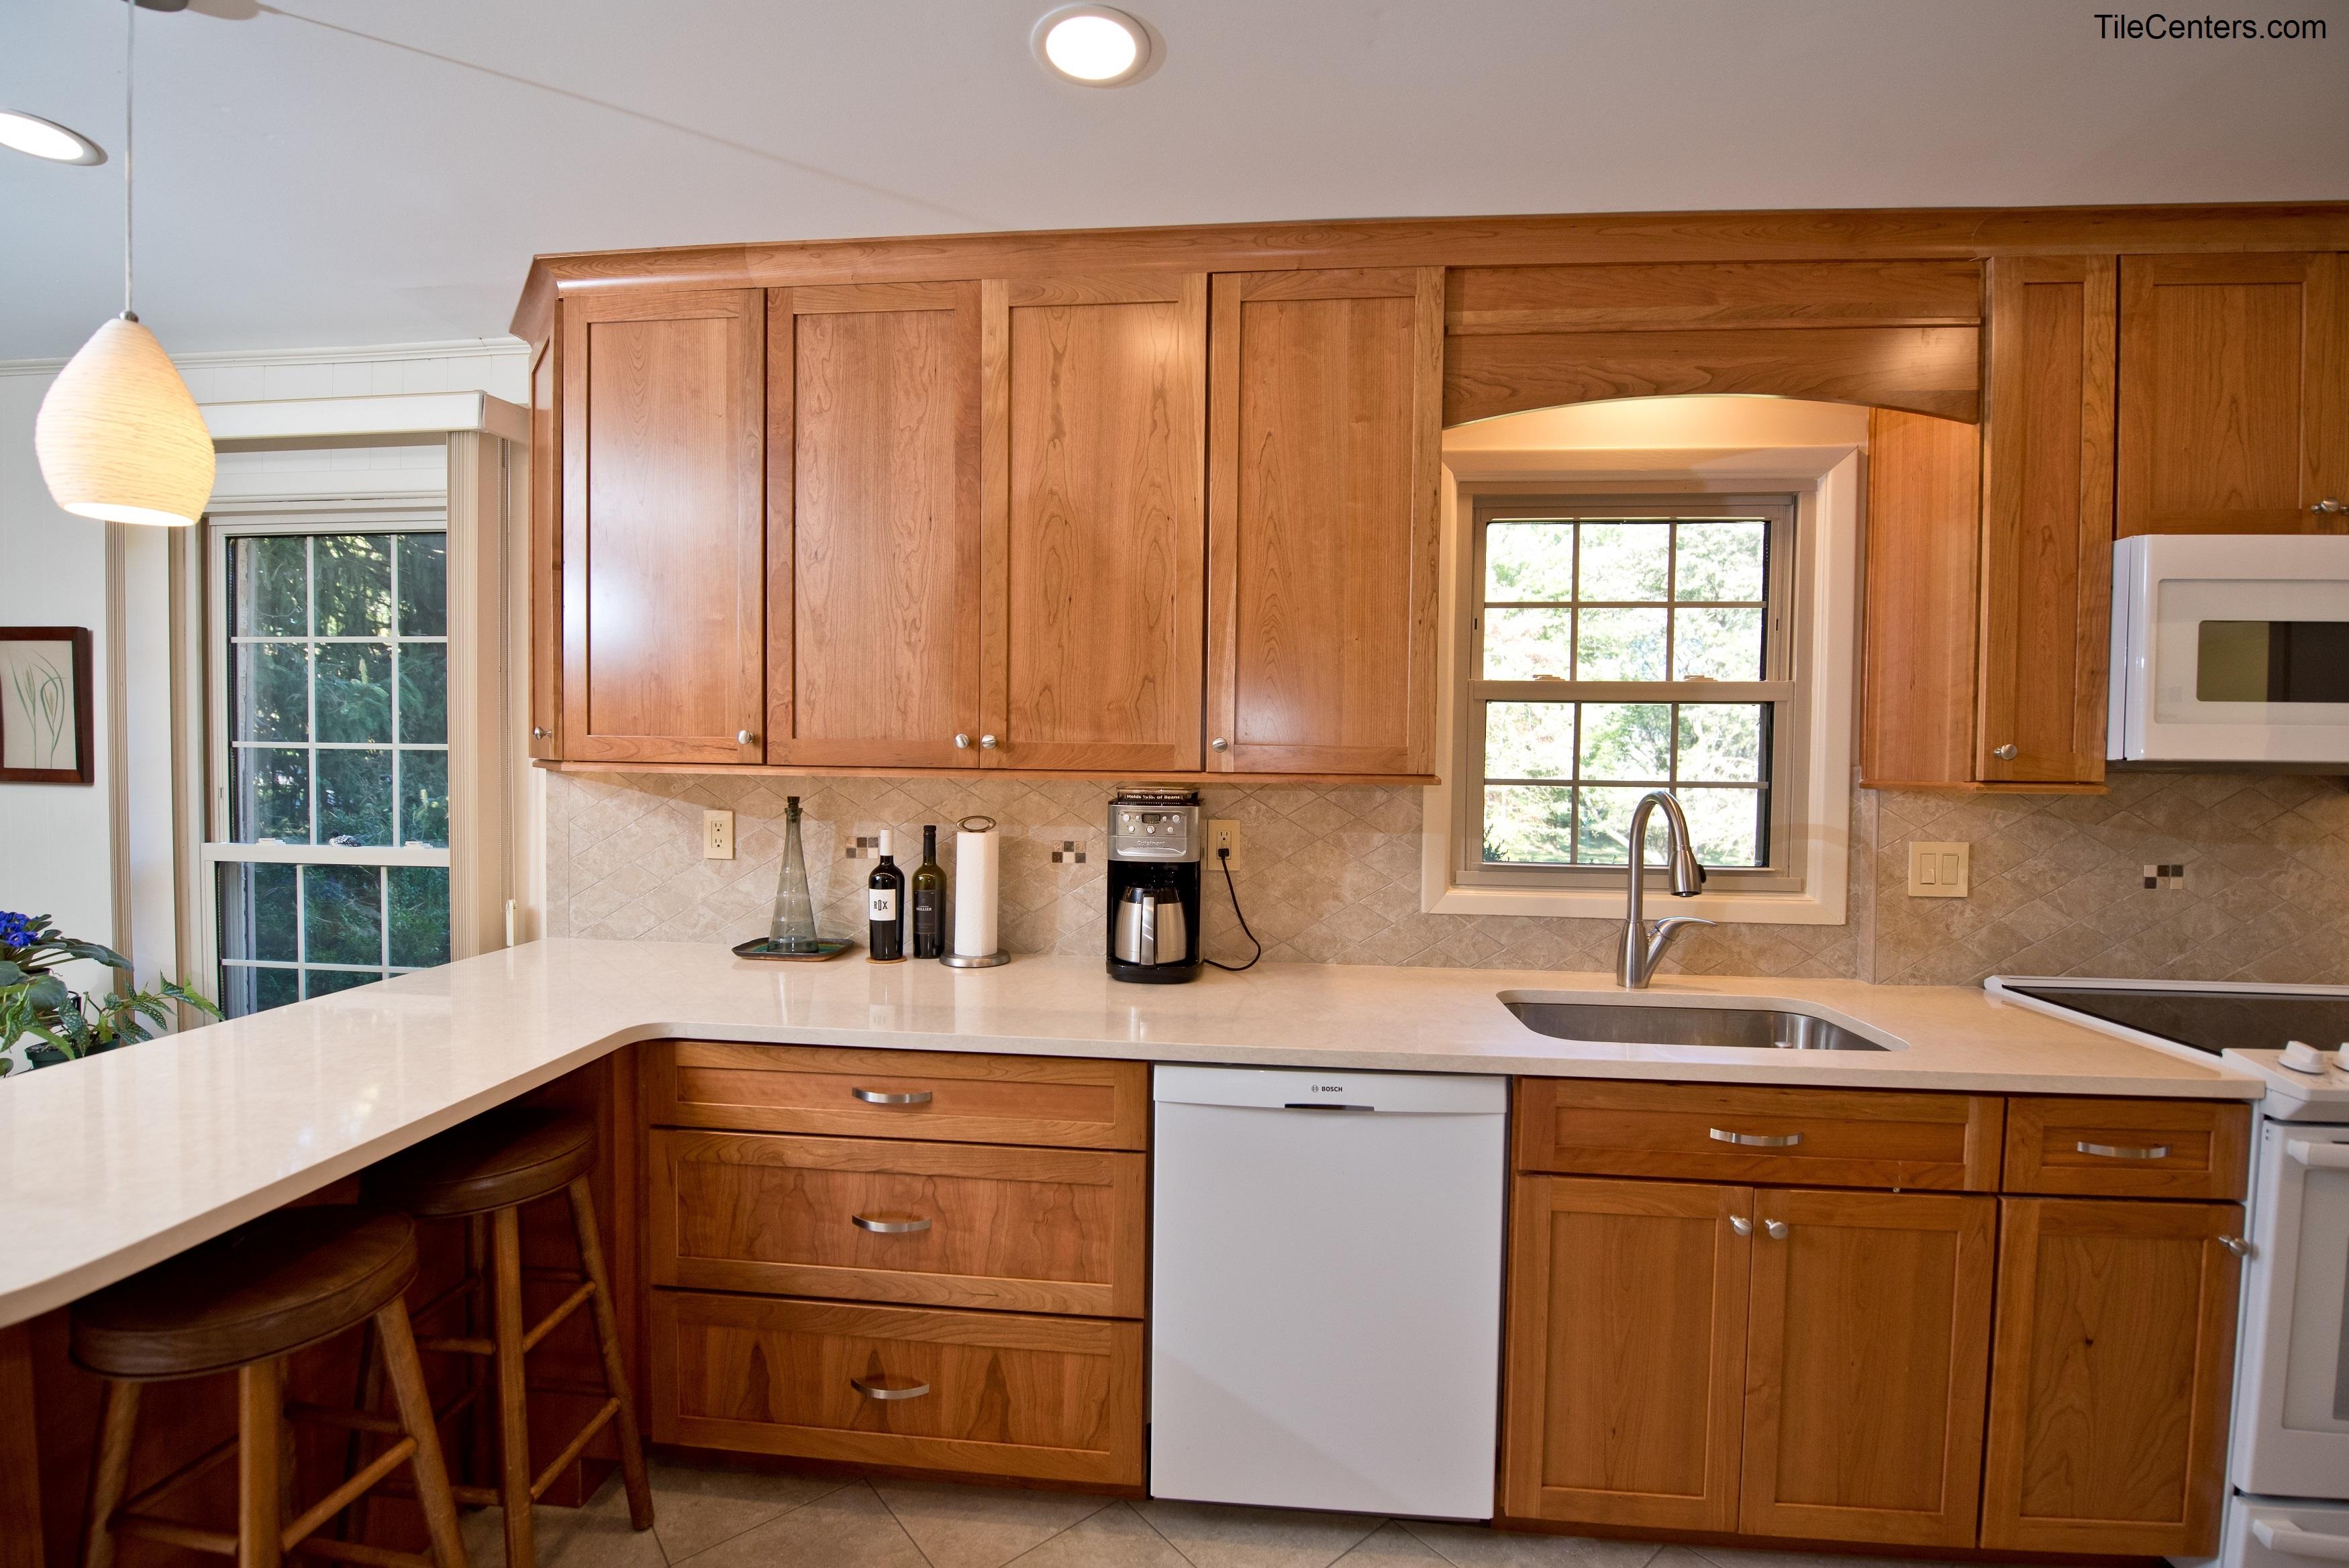 Kitchen Remodel - Wye Oak Dr, Gaithersburg, MD 20878